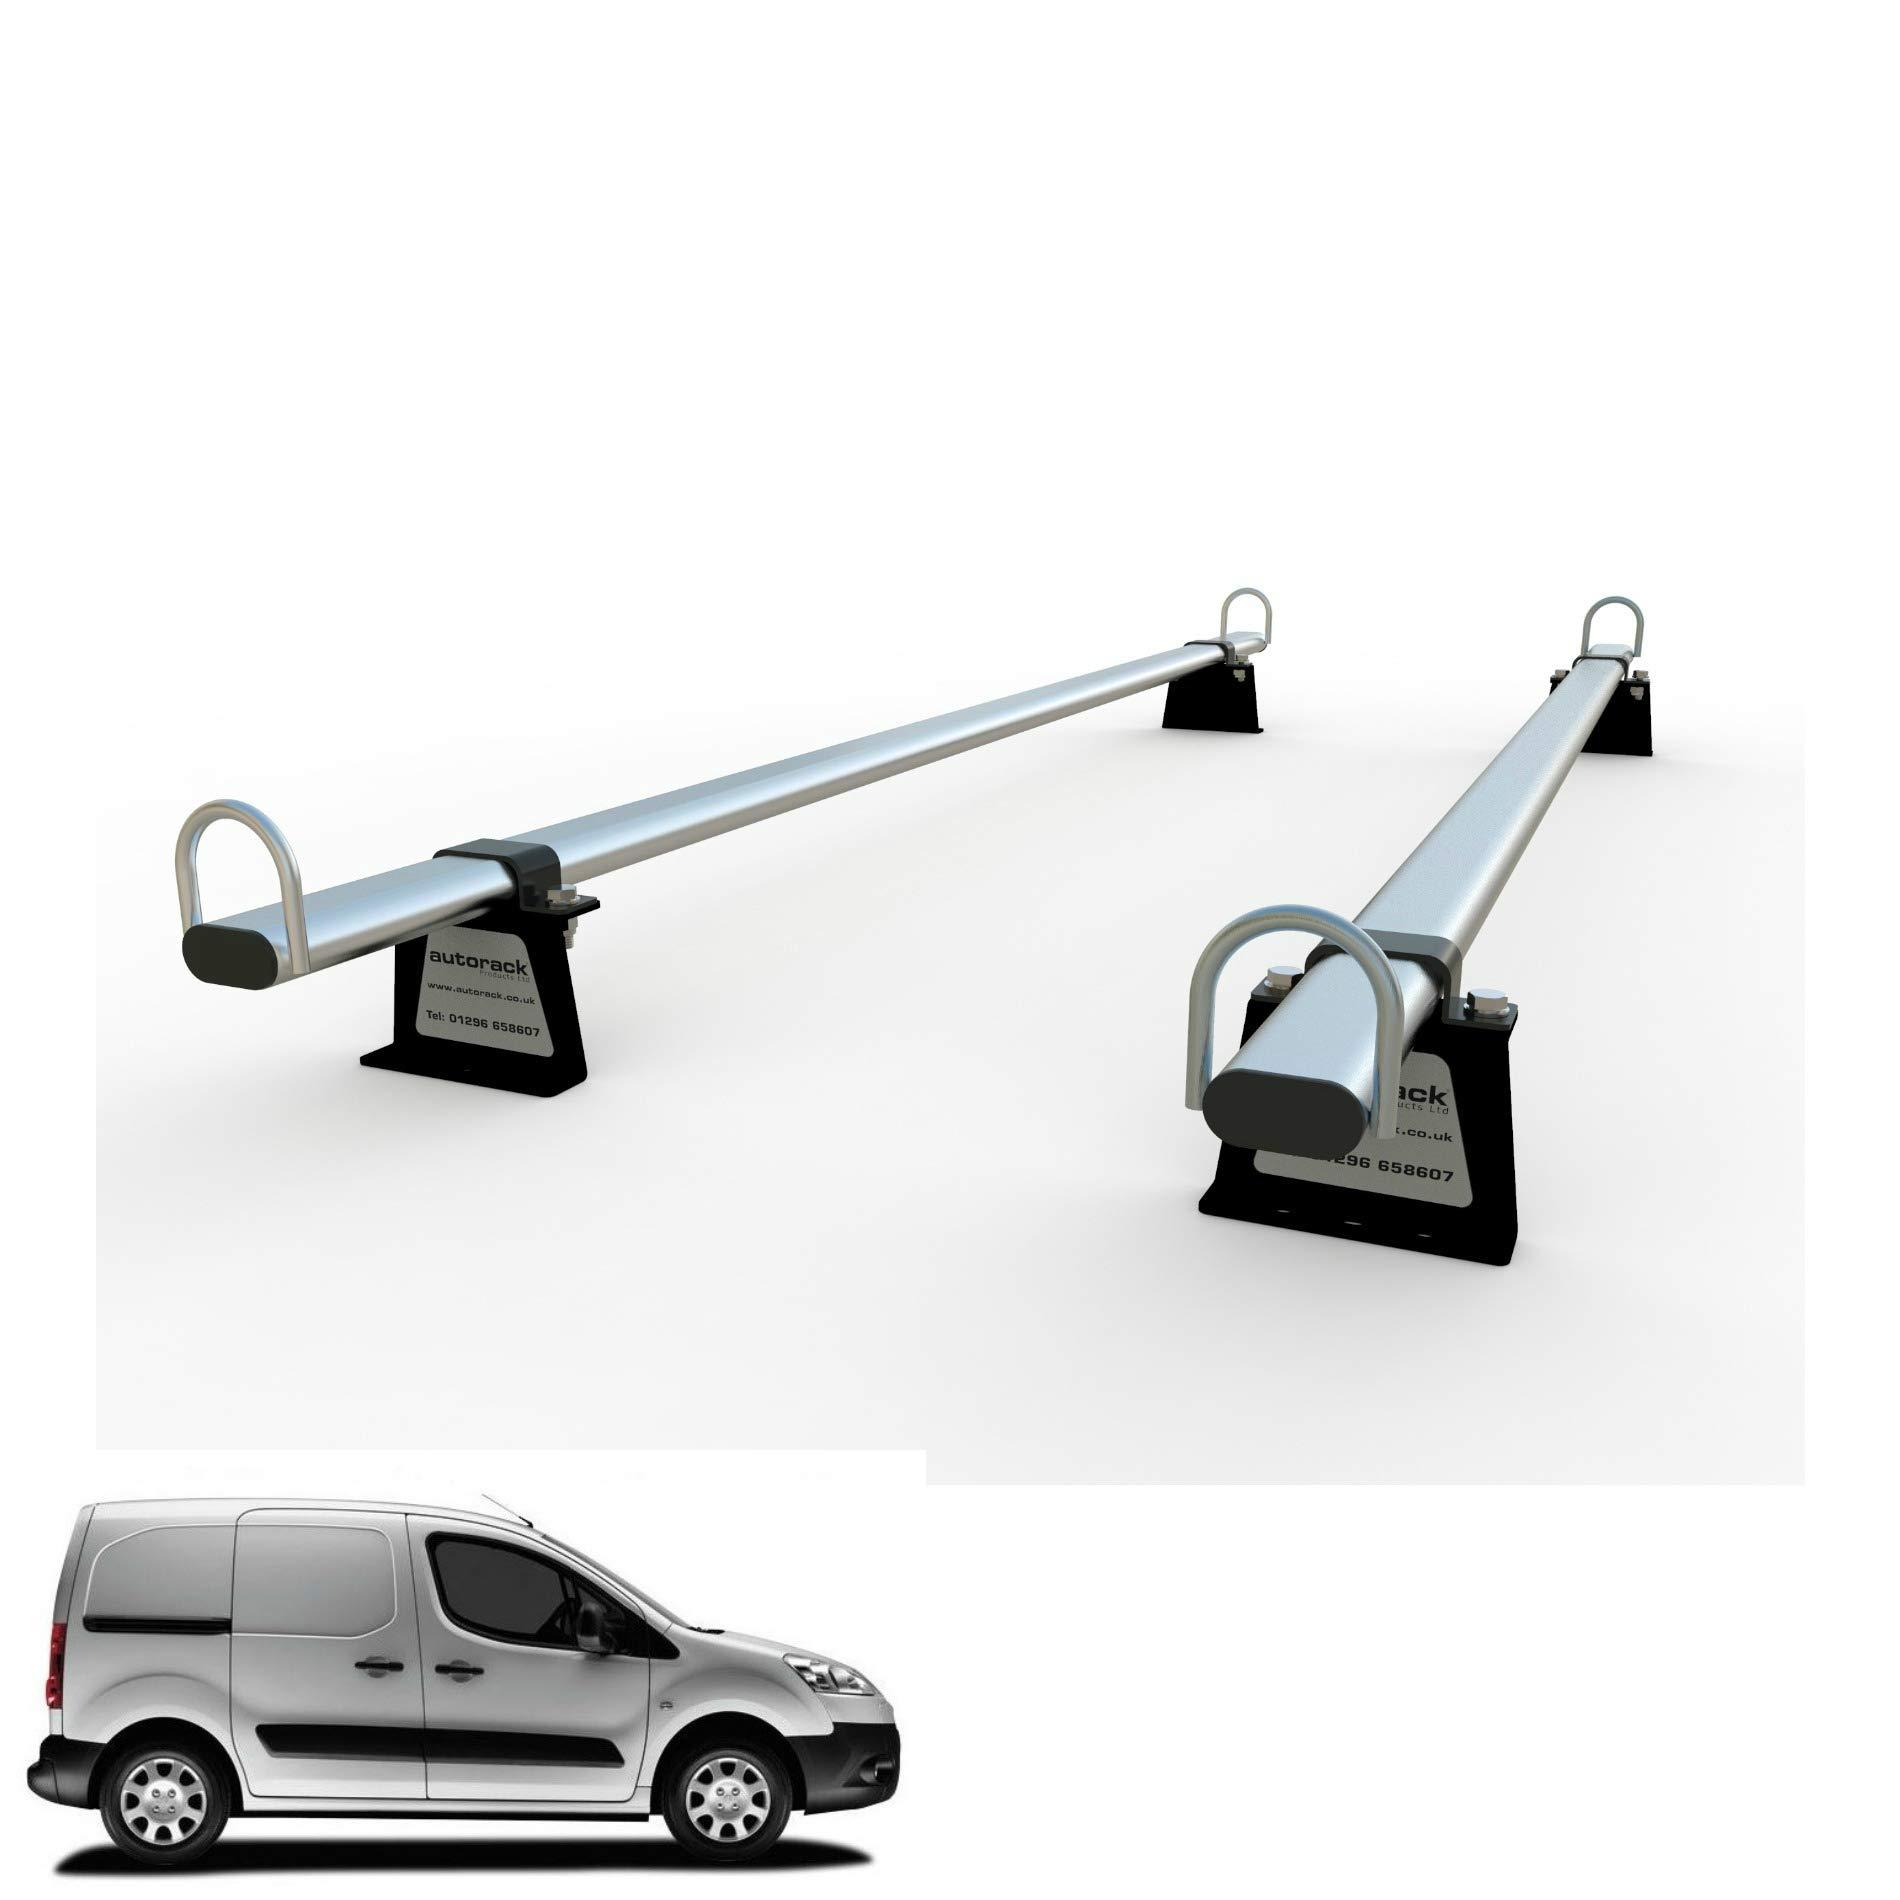 UKB4C Aluminium Roof Rack Cross Bars fits Peugeot Bipper 2008-2016 3/&4,5 door